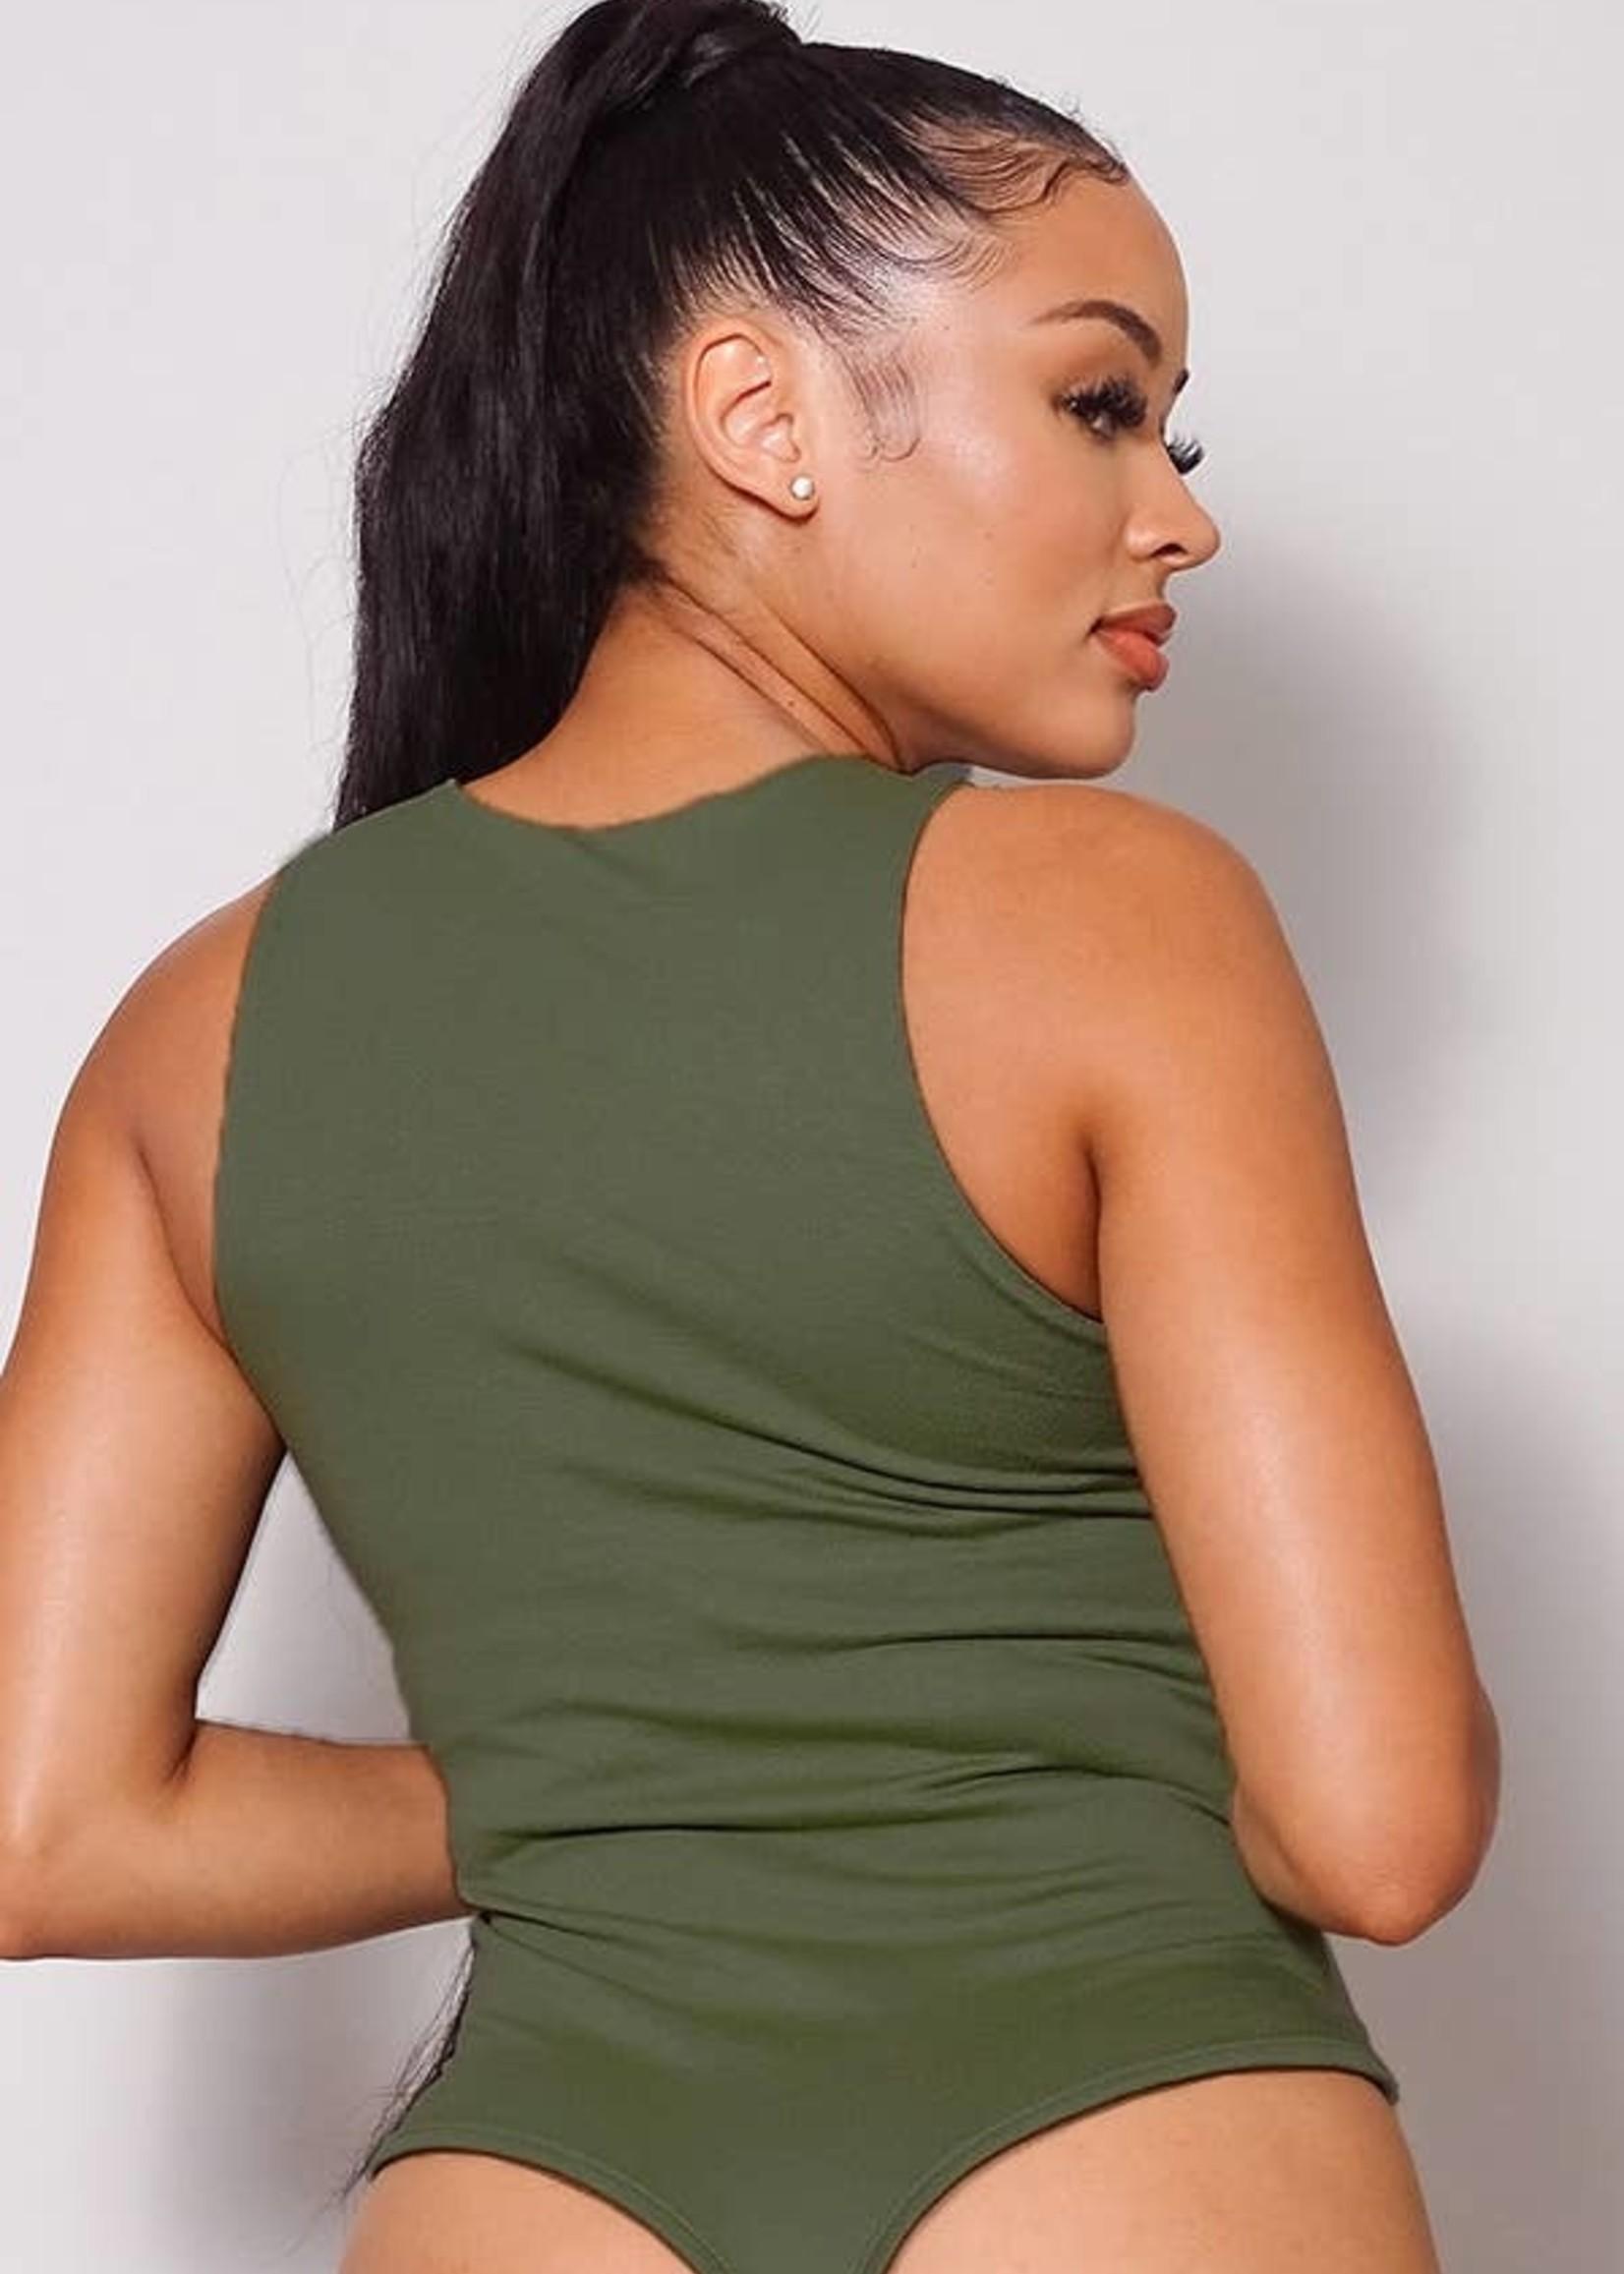 LeBLANC finds Sleeveless Bodysuit